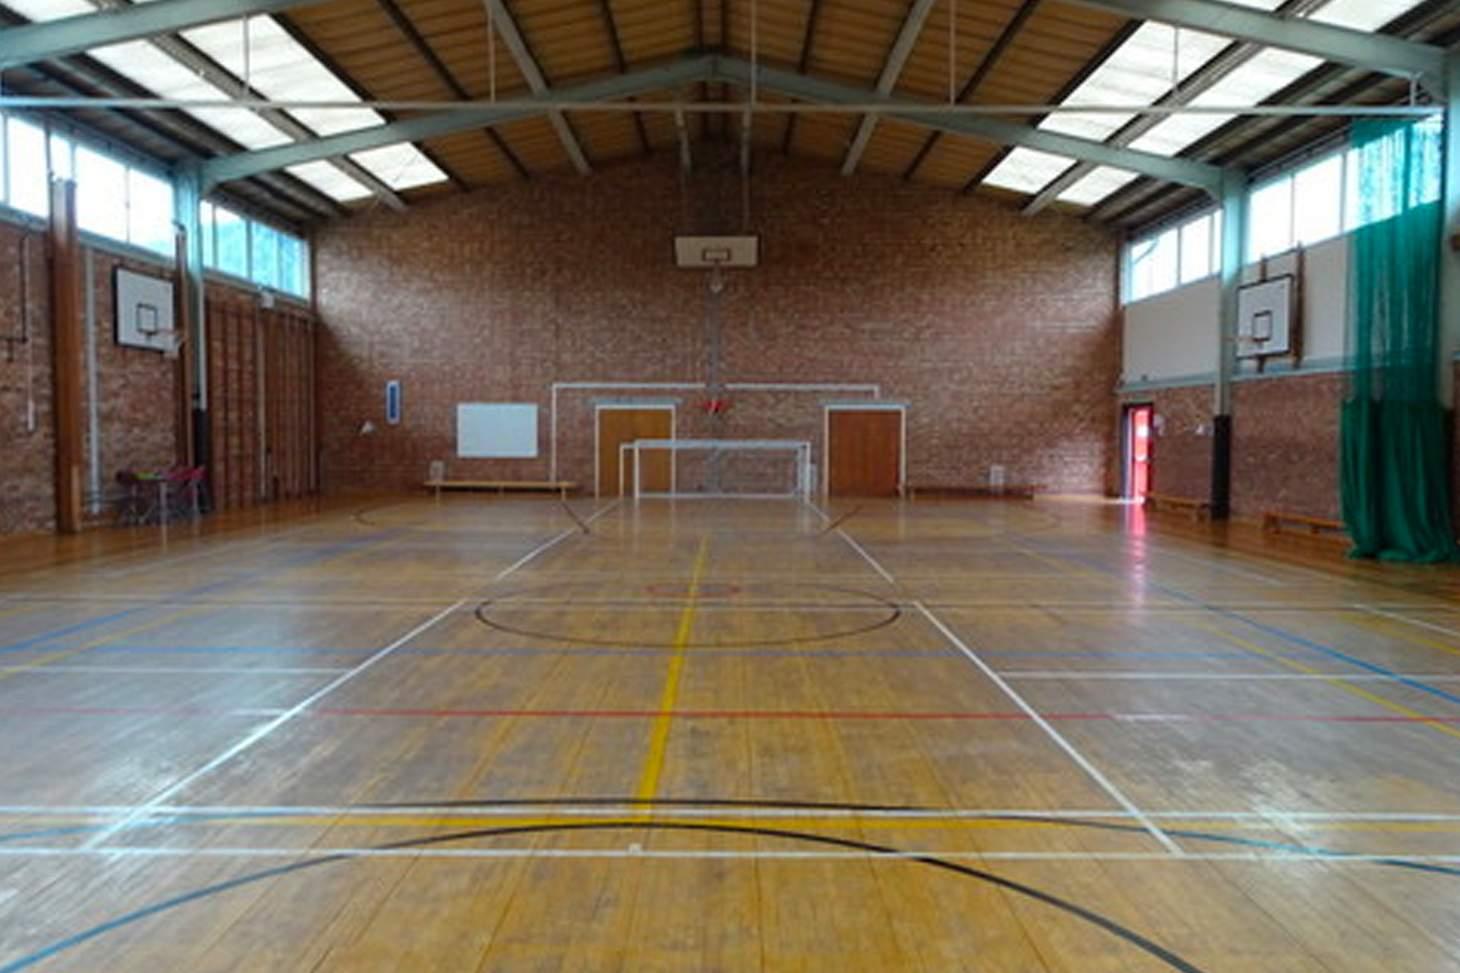 Trevelyan Middle School Court   Sports hall netball court